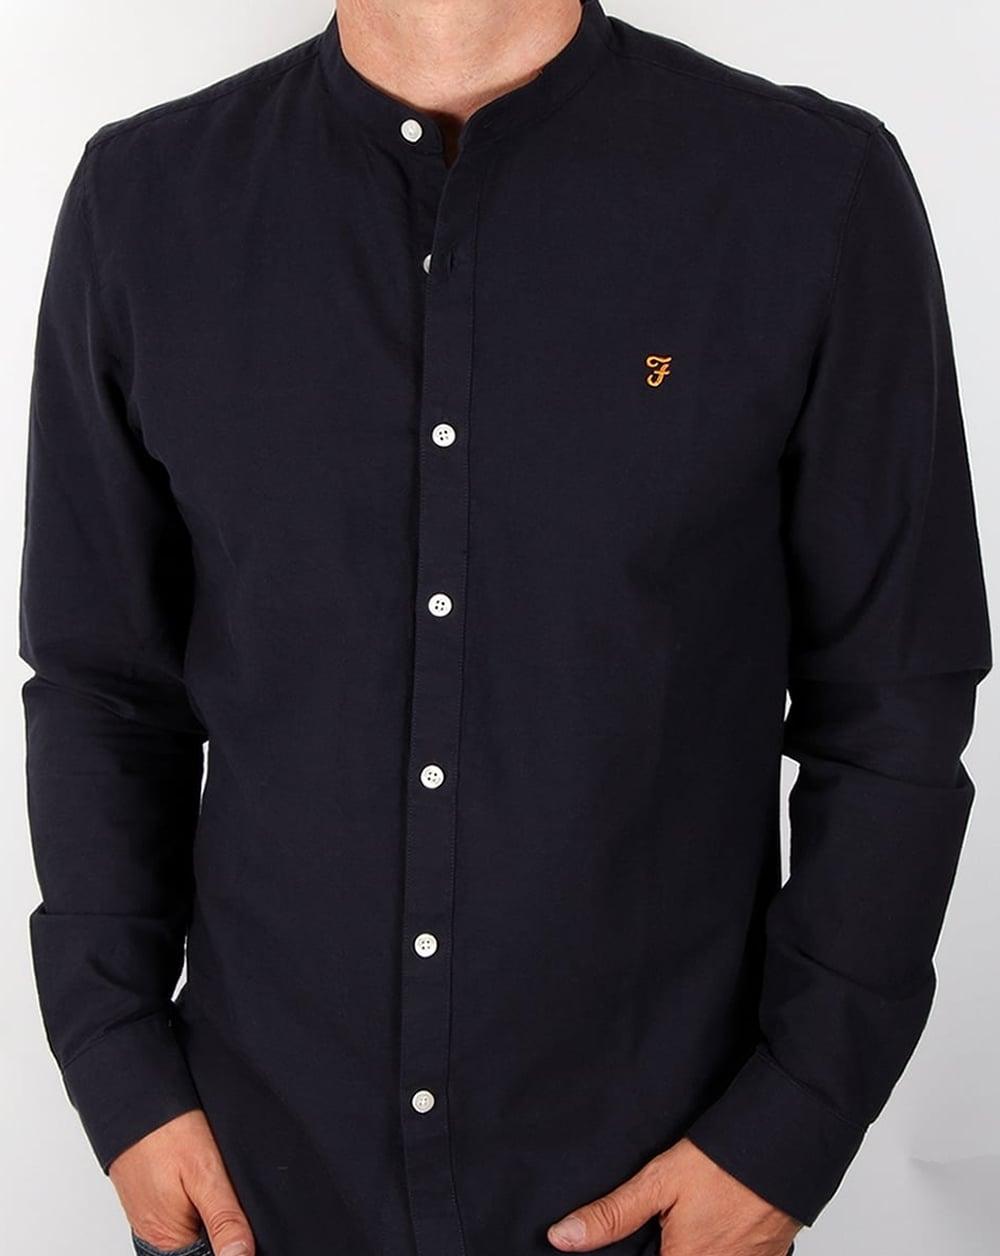 Farah Brewer Grandad Collar Shirt Navy, Men's, Long Sleeve, Casual